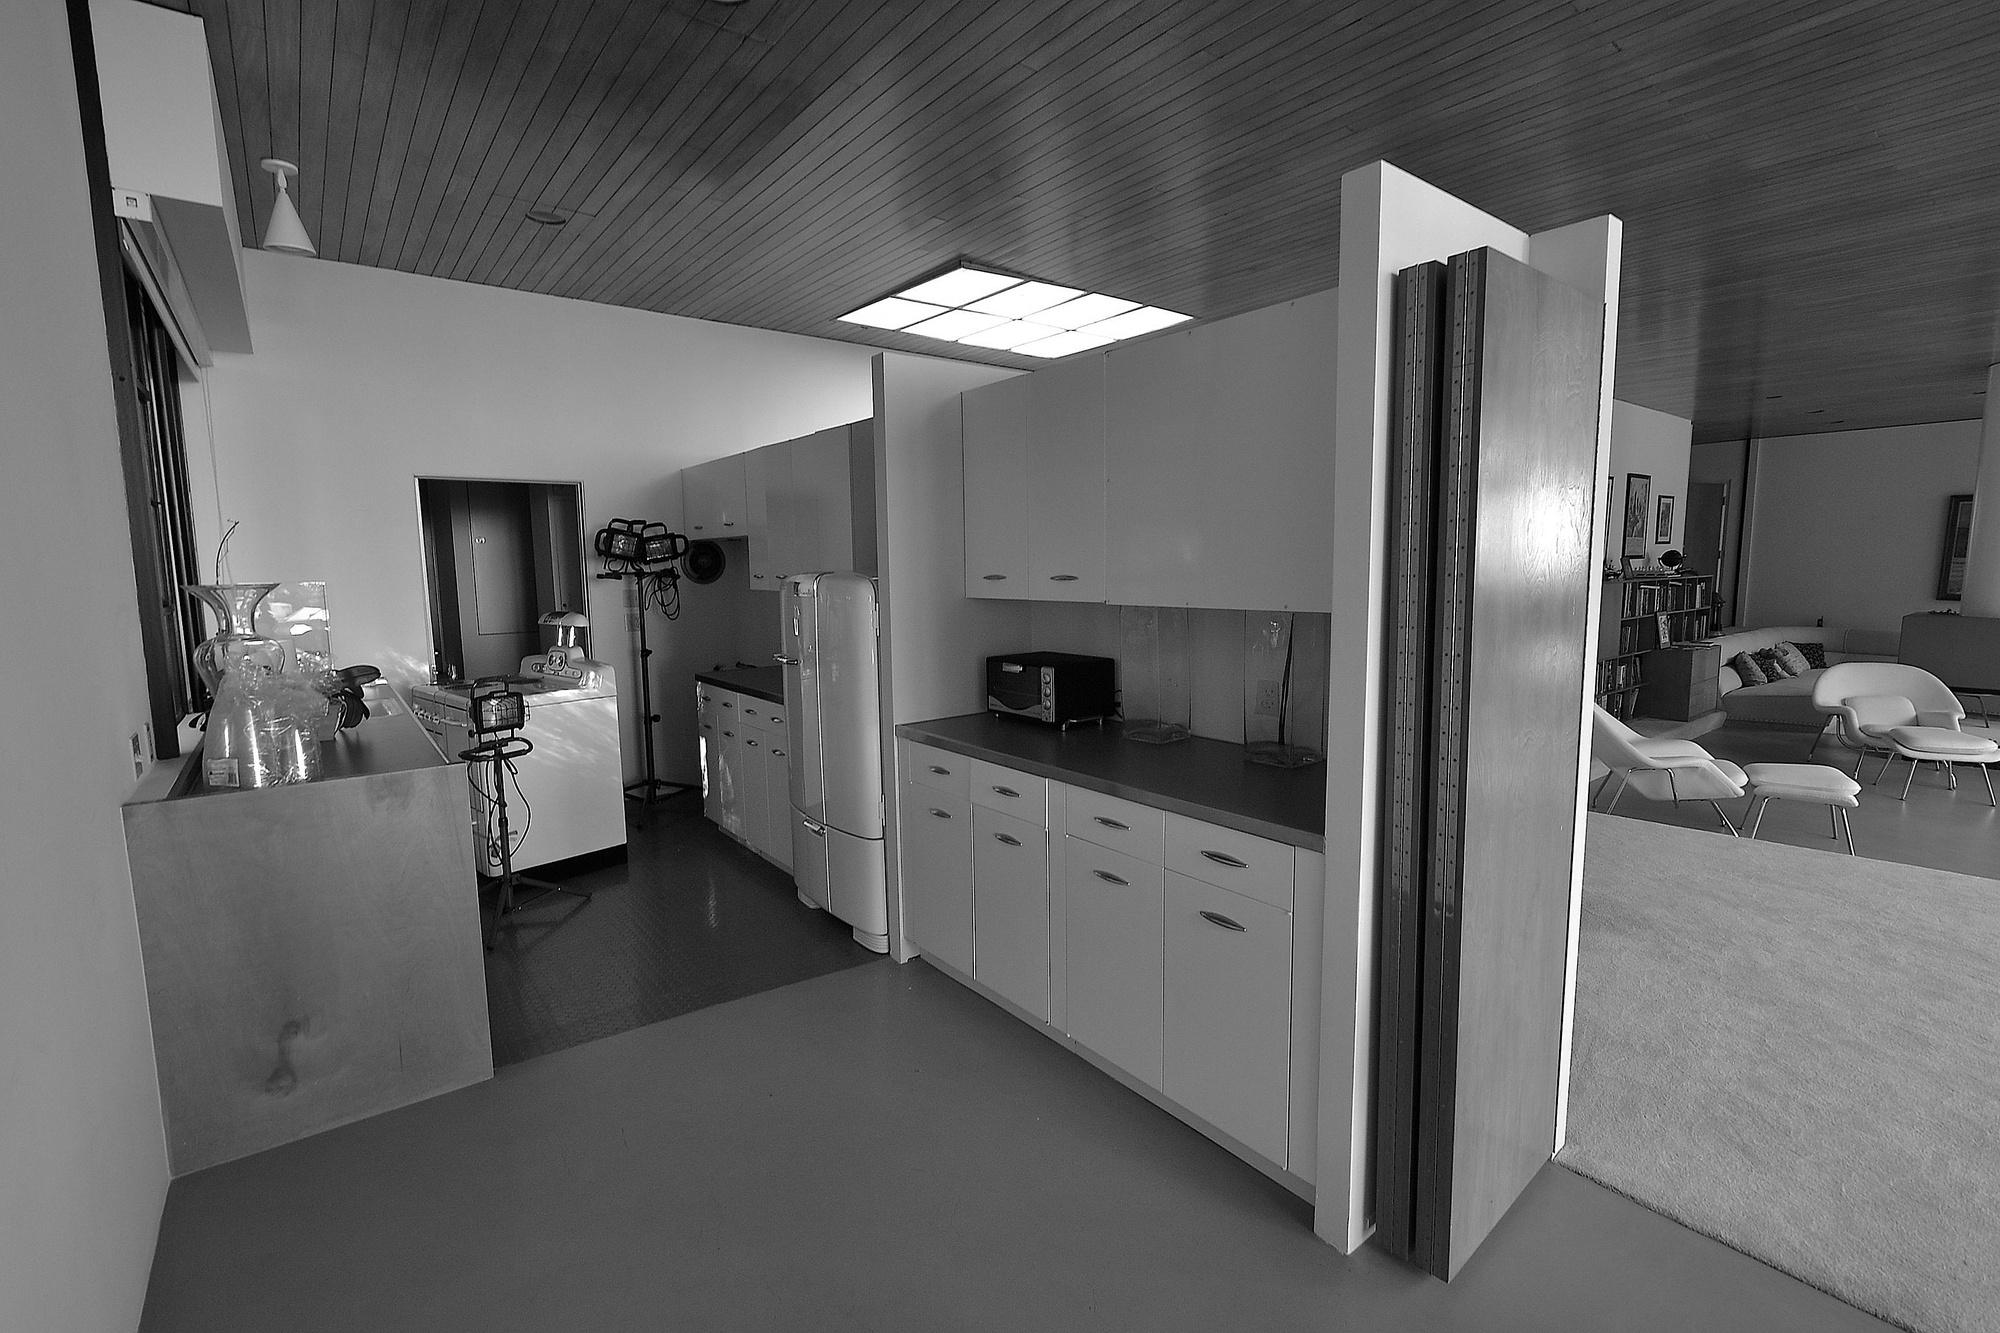 case study house      eames house living room Galinsky